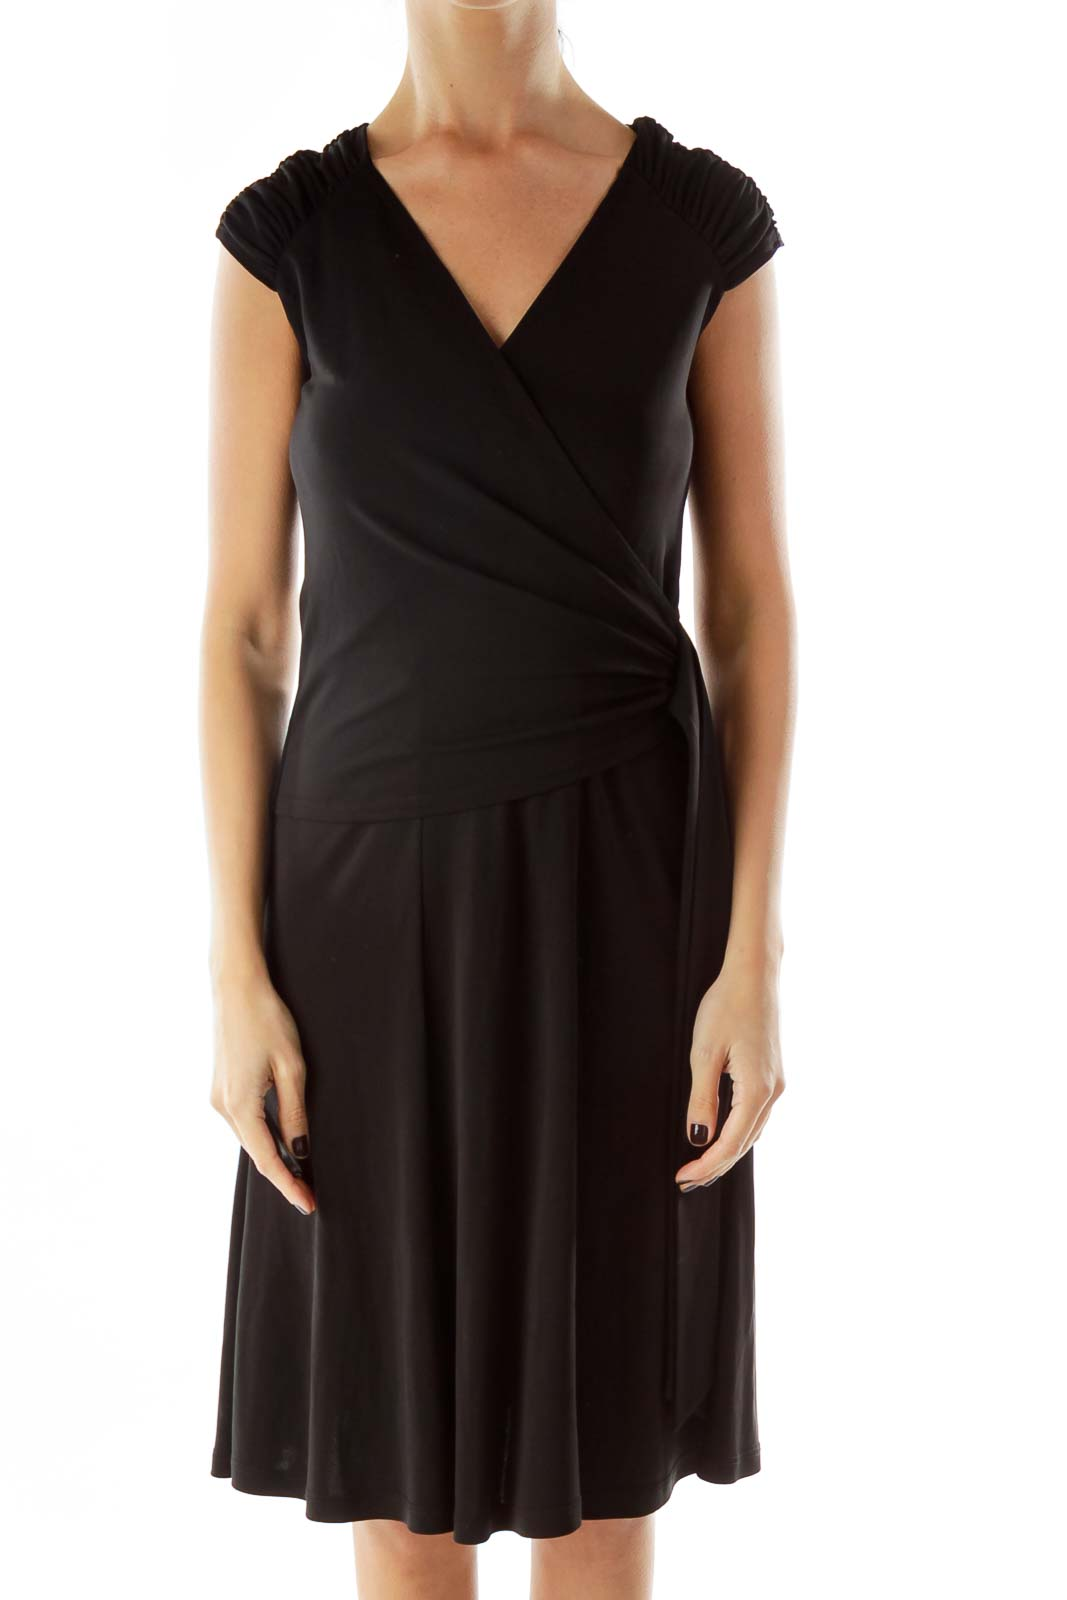 Black Sleeveless Cocktail Dress